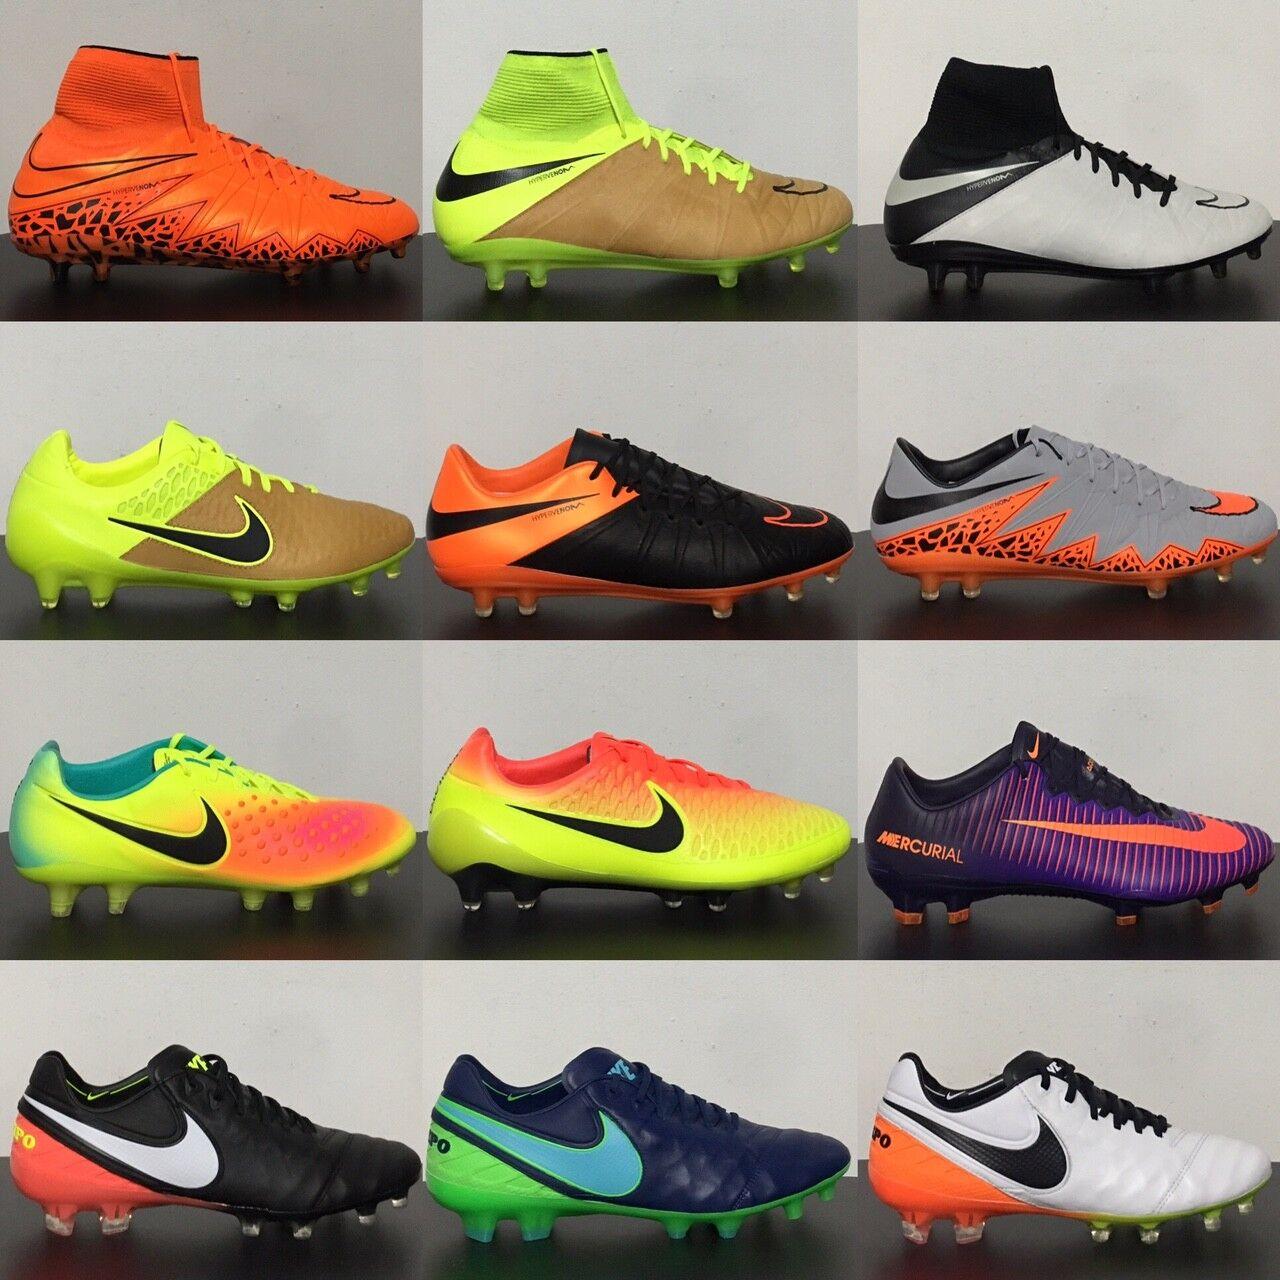 Nike Hypervenom Phantom Magista Opus Mercurial Vapor Tiempo Legend Soccer Cleat